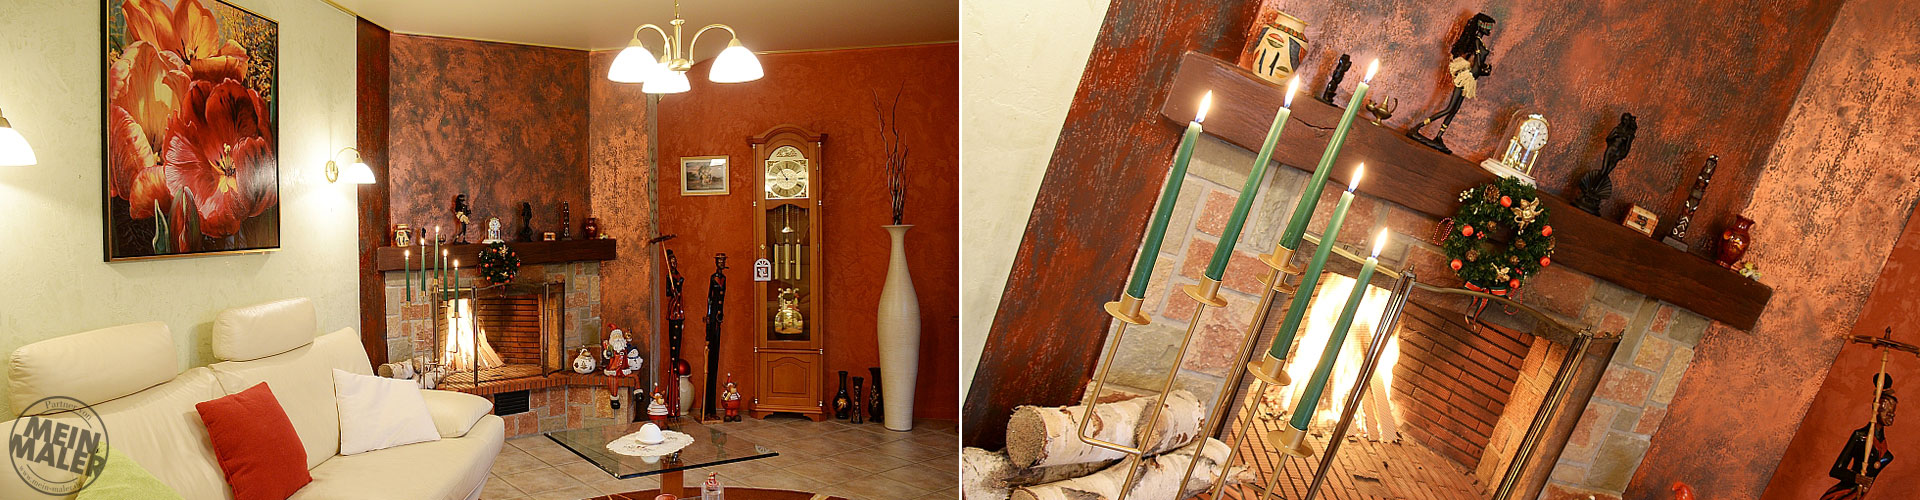 Fläming malerei, treuenbrietzen / potsdam   wandgestaltung ...